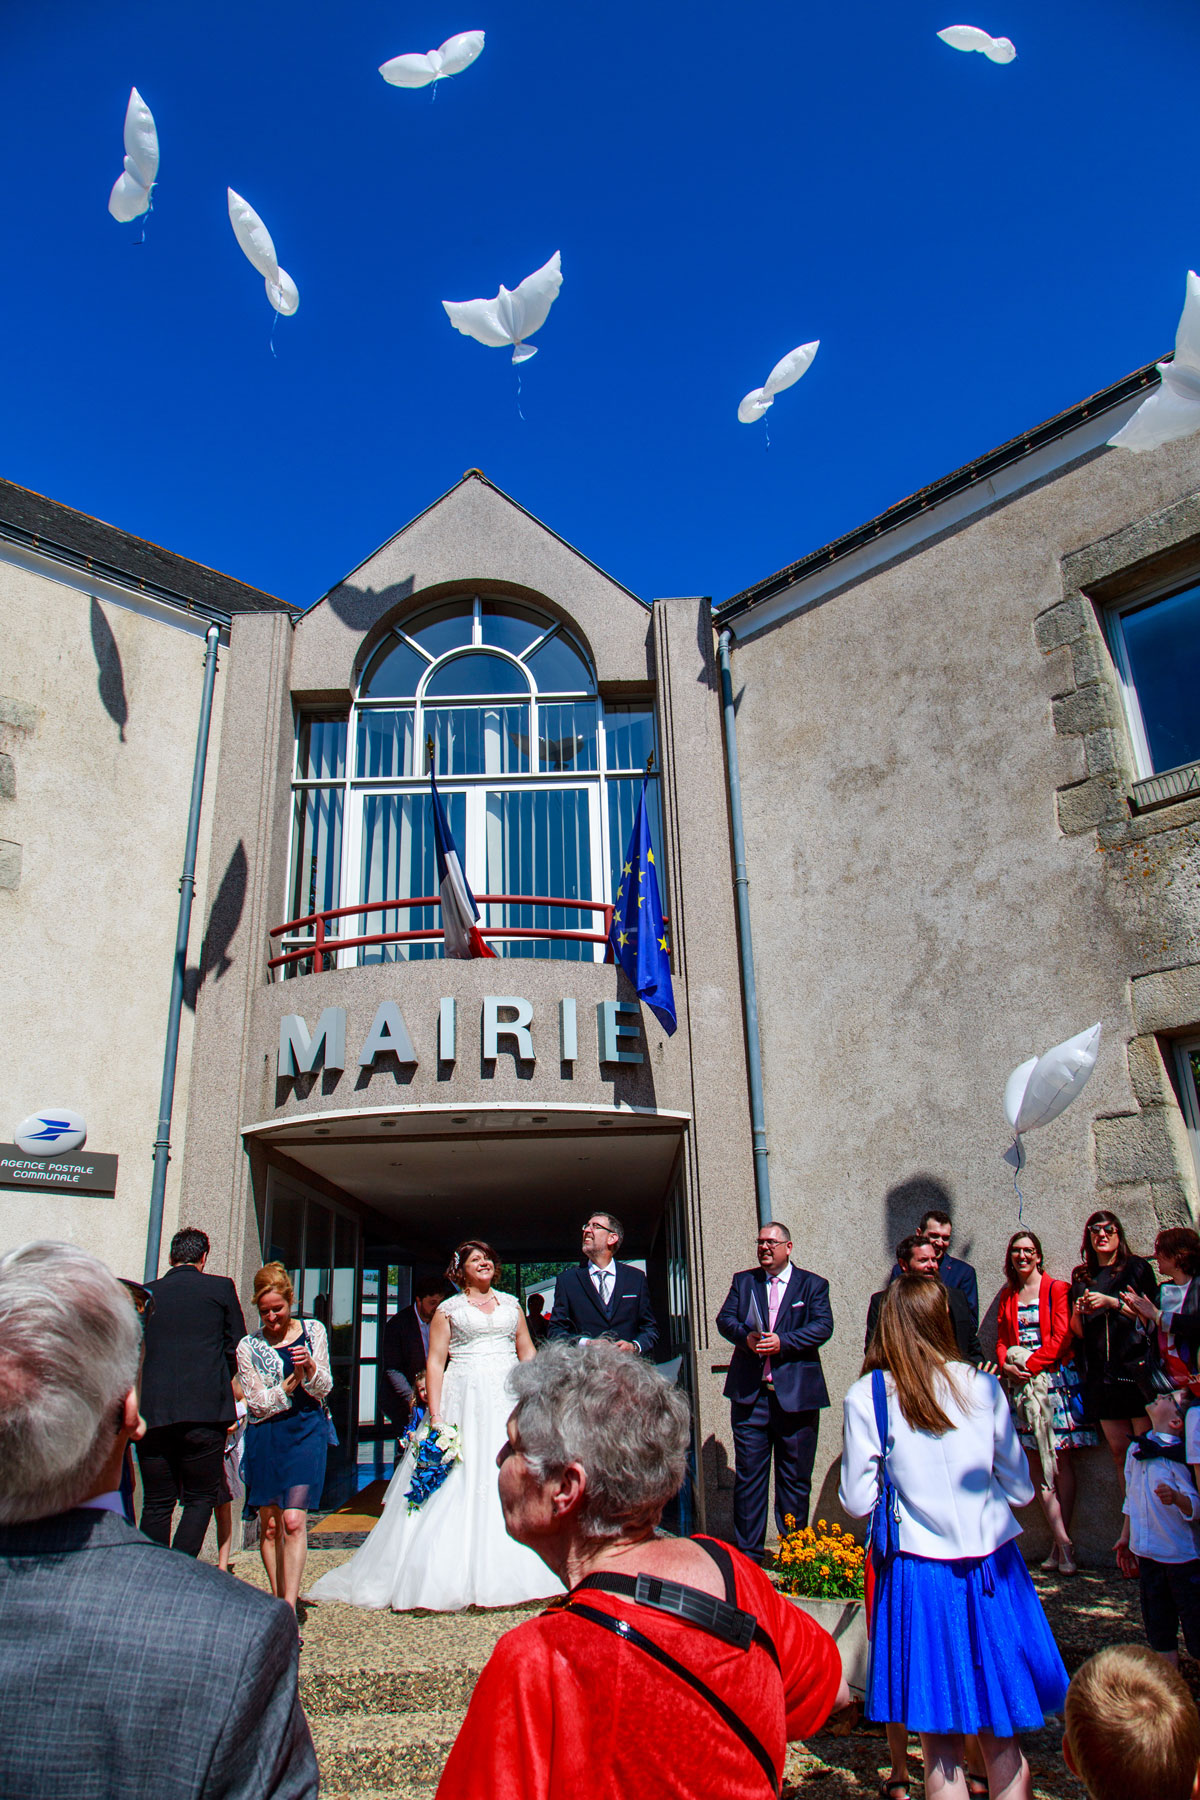 photographie de mariages mairie de mesquer